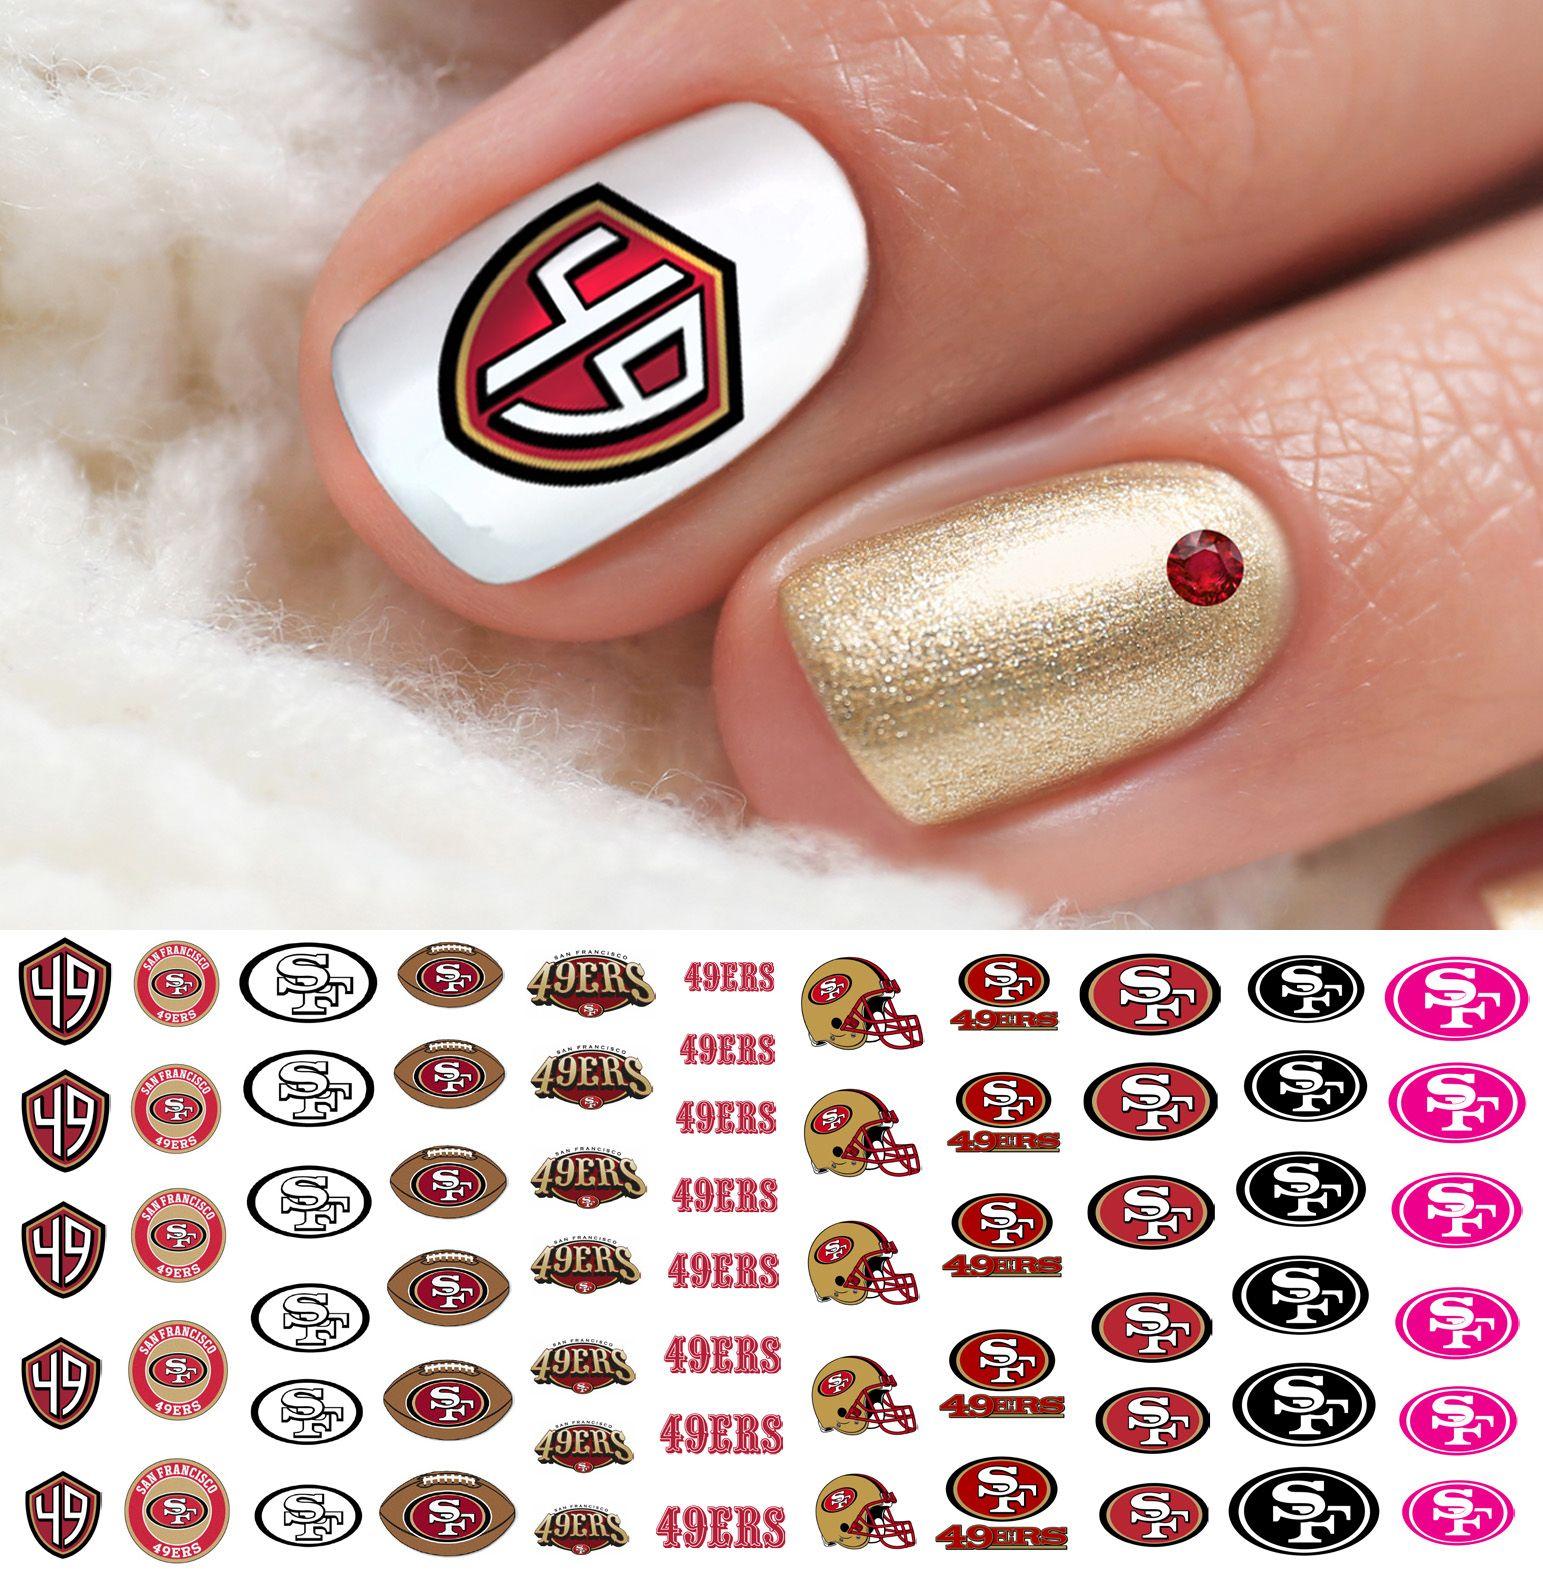 San Francisco 49ers Football Nail Art Decals Football Nails Football Nail Designs Football Nail Art